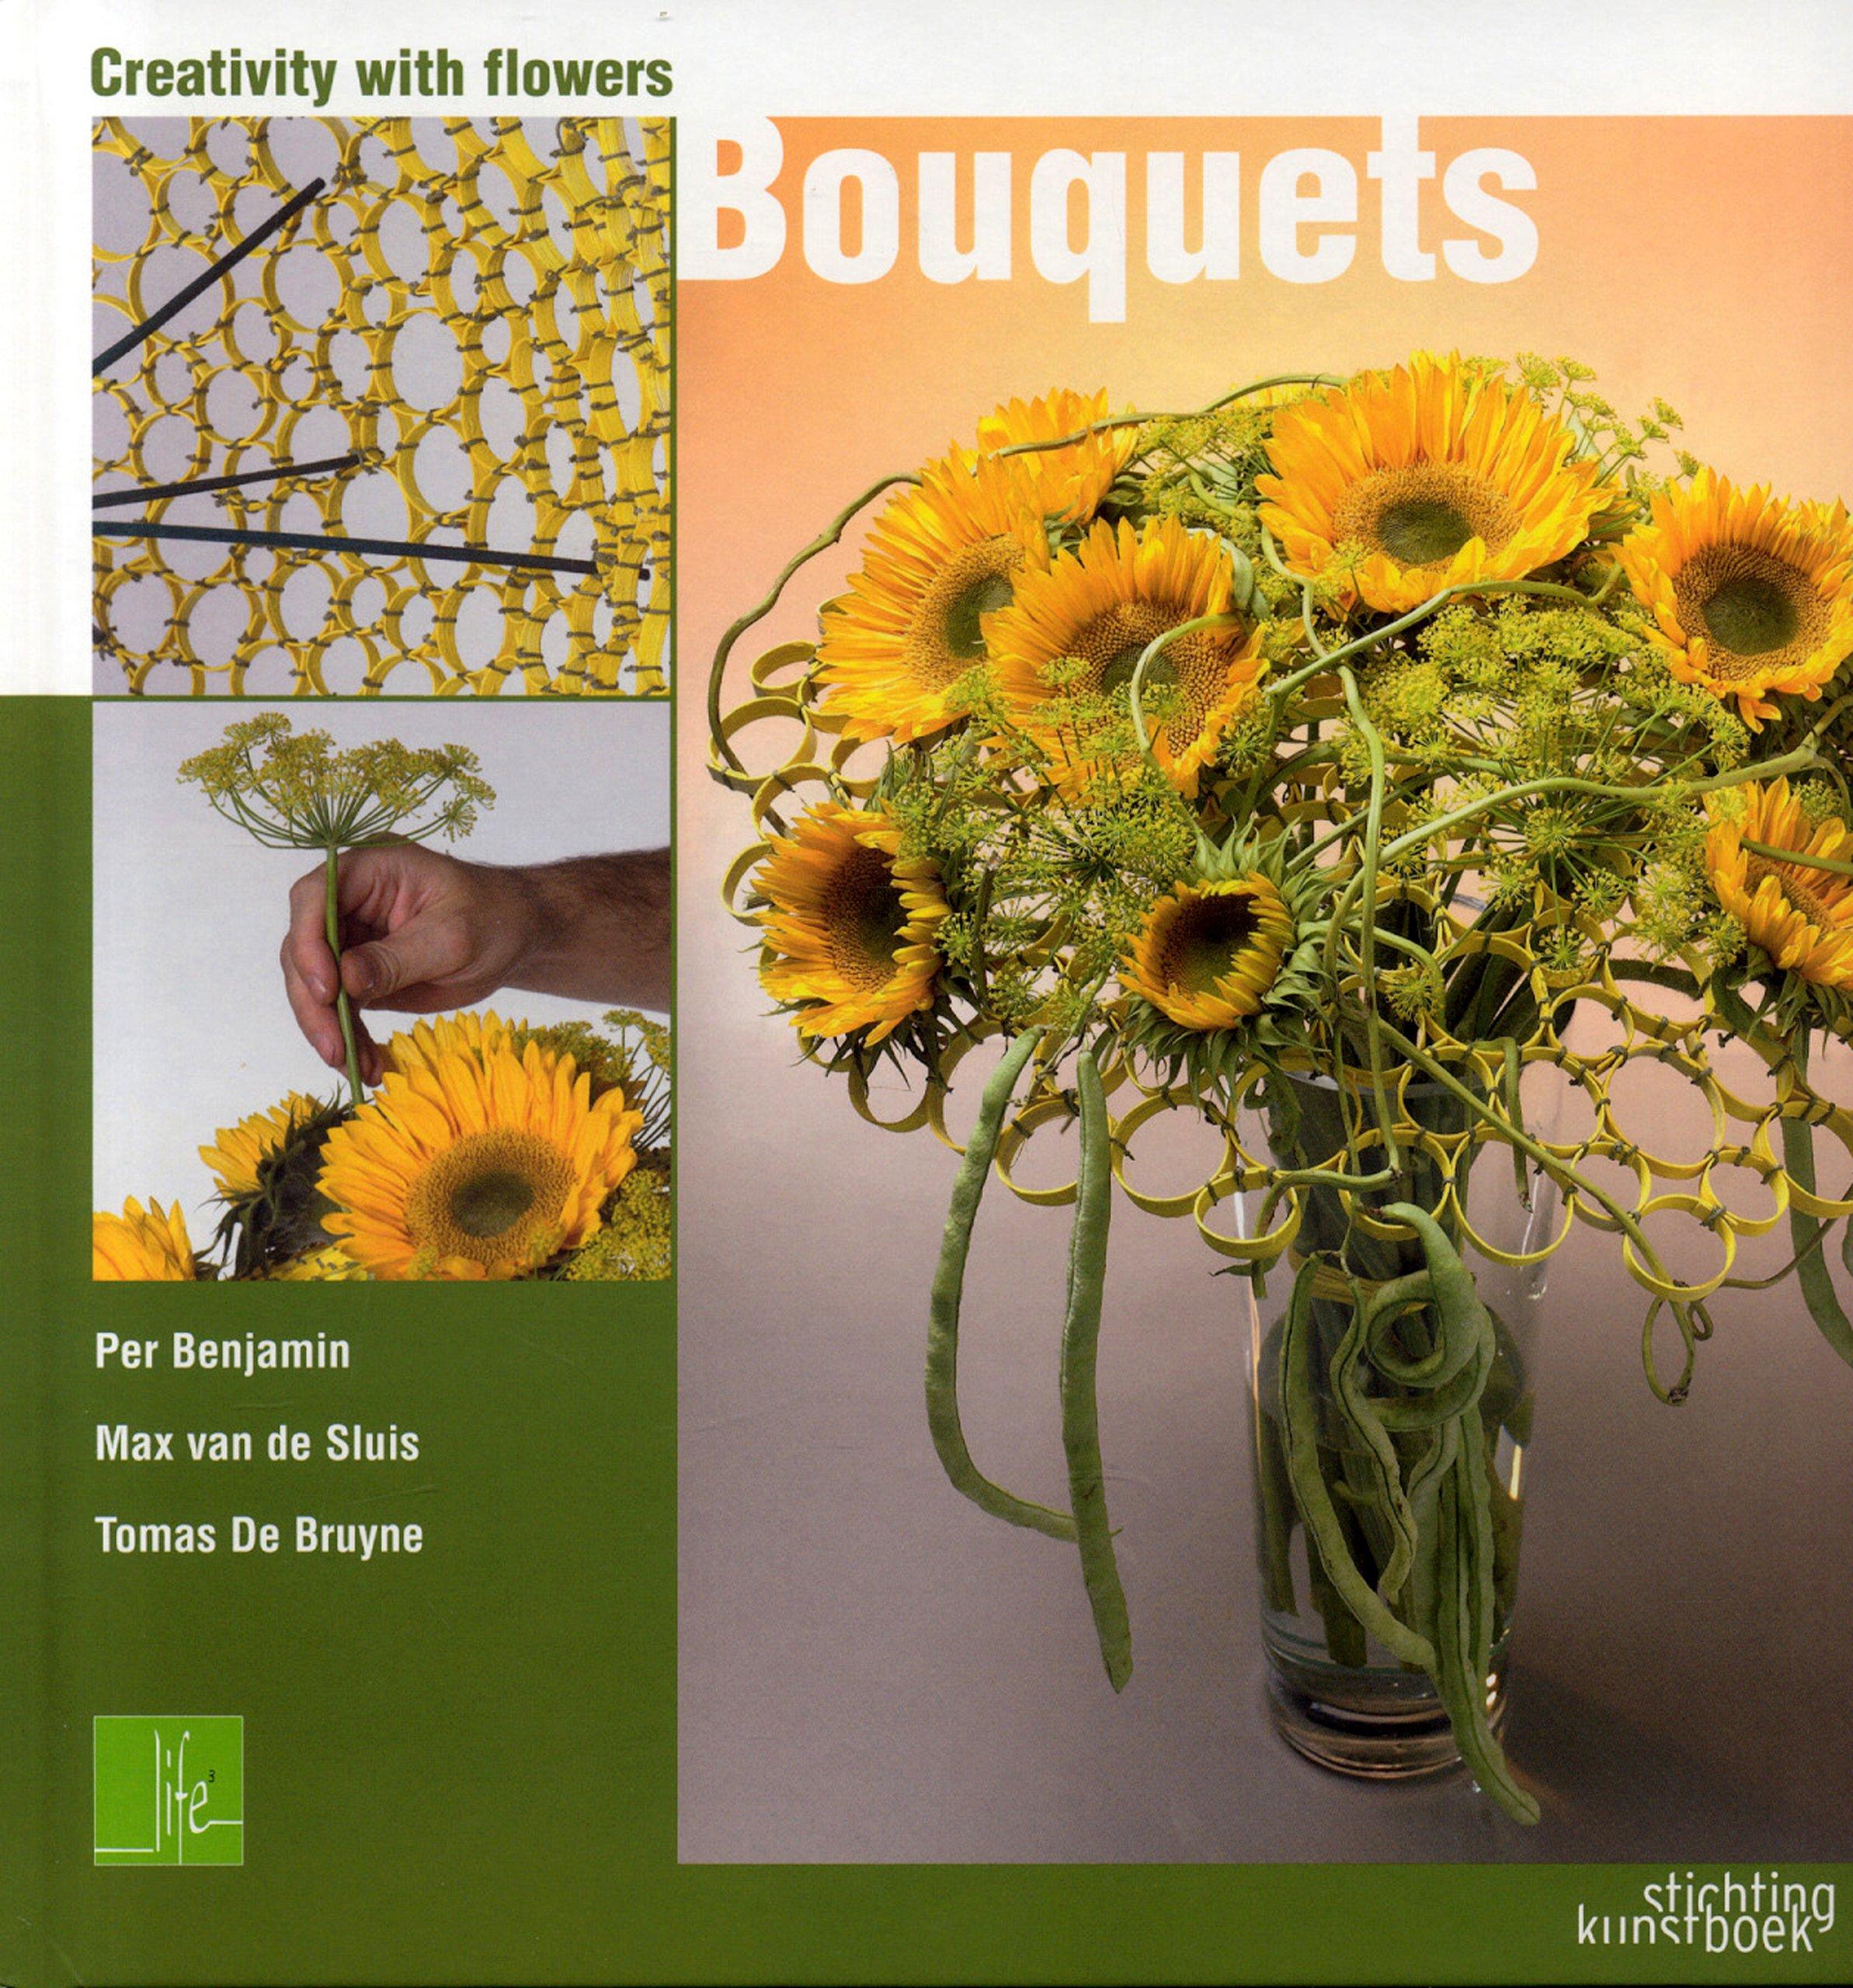 Creativity with flowers bouquets per benjamin tomas de bruyne creativity with flowers bouquets per benjamin tomas de bruyne max van de sluis 9789058561886 amazon books izmirmasajfo